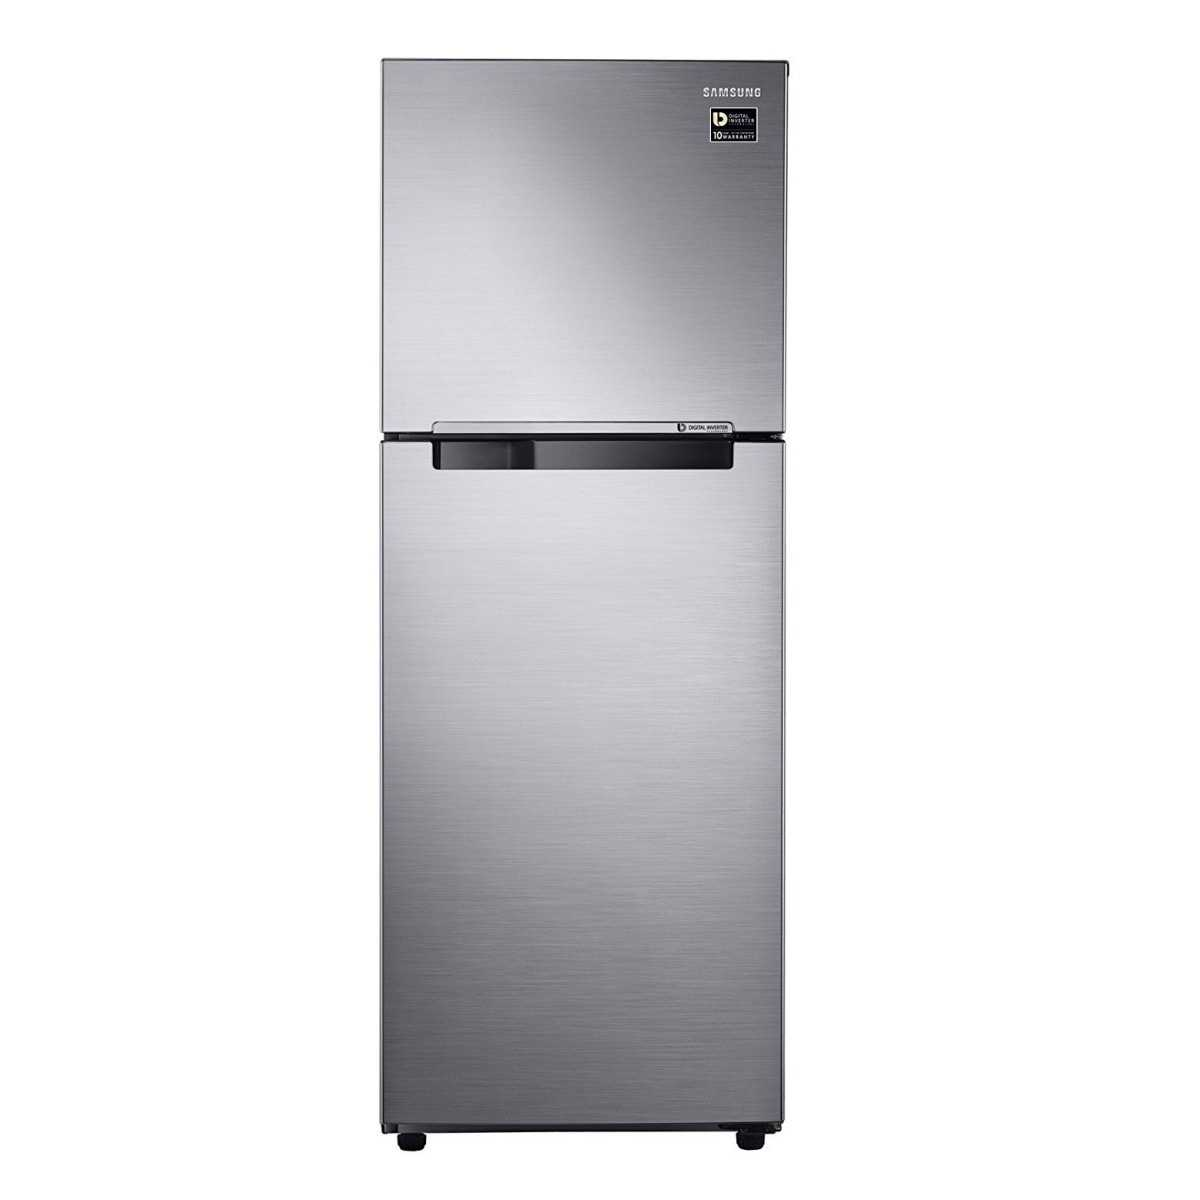 Samsung RT34M3023S8 HL/NL 321 Litre Double Door Frost Free Refrigerator